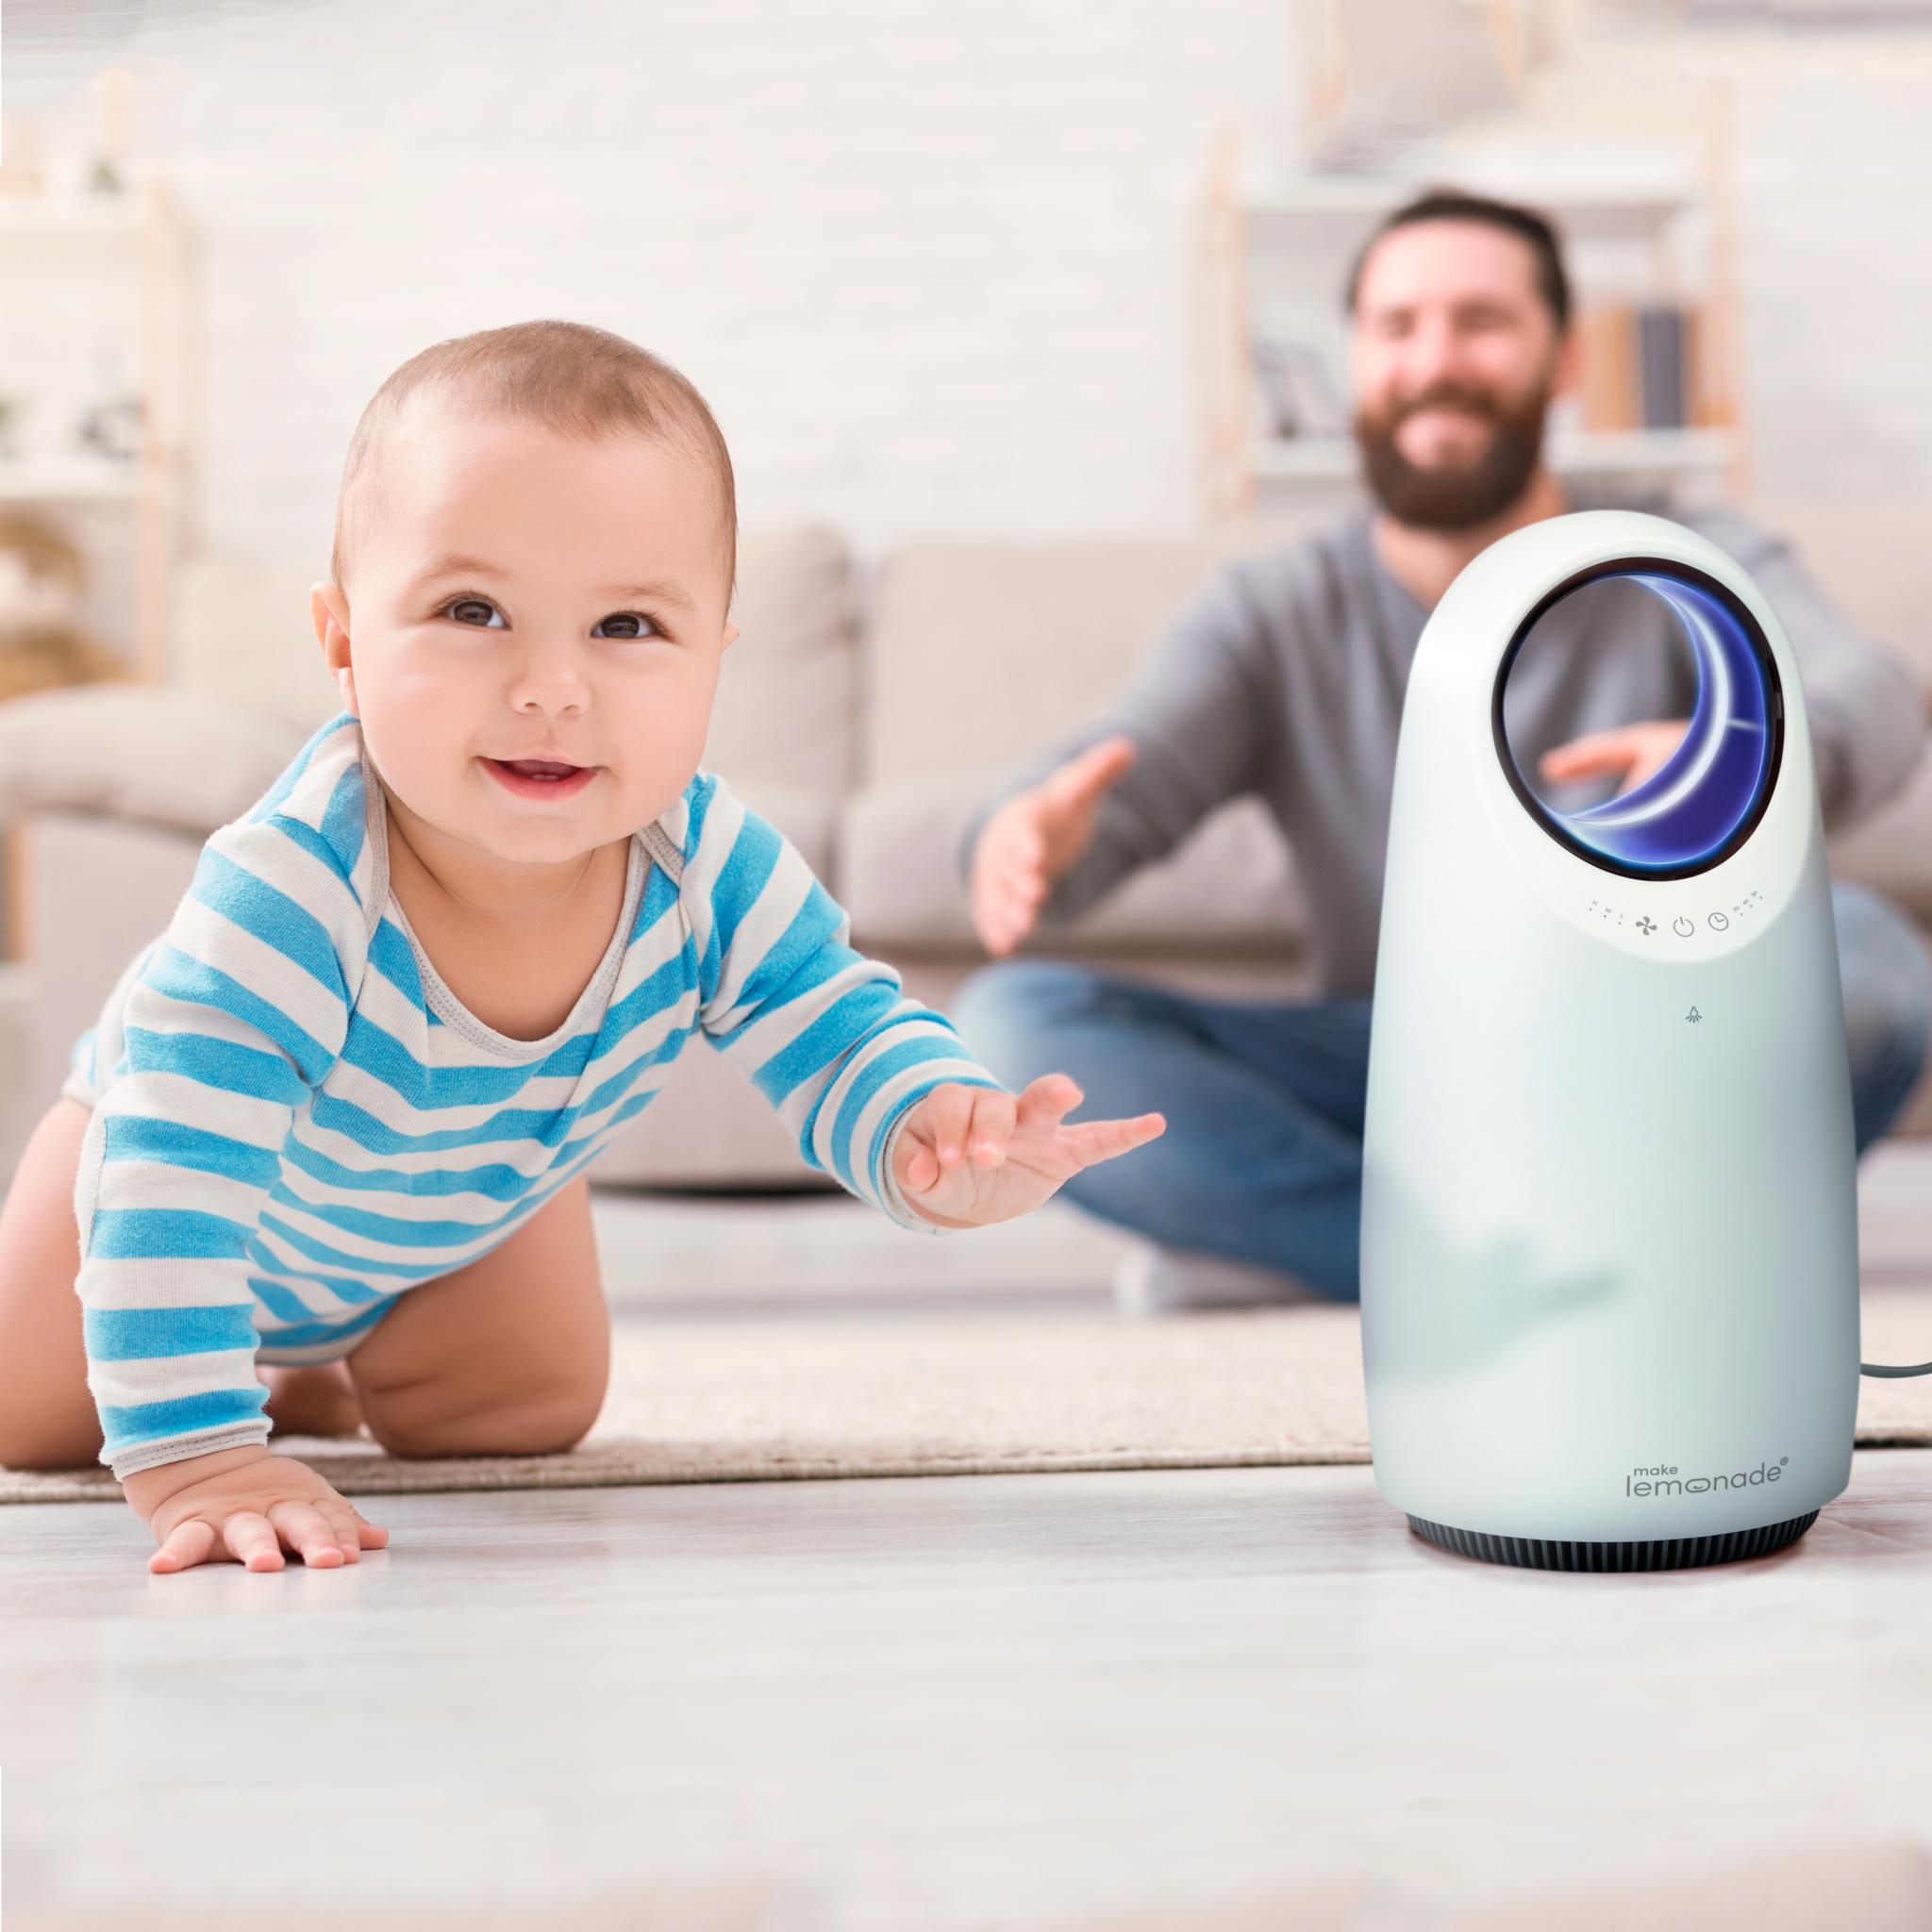 Halo Air Purifier Air purifier, Purifier, Injury prevention